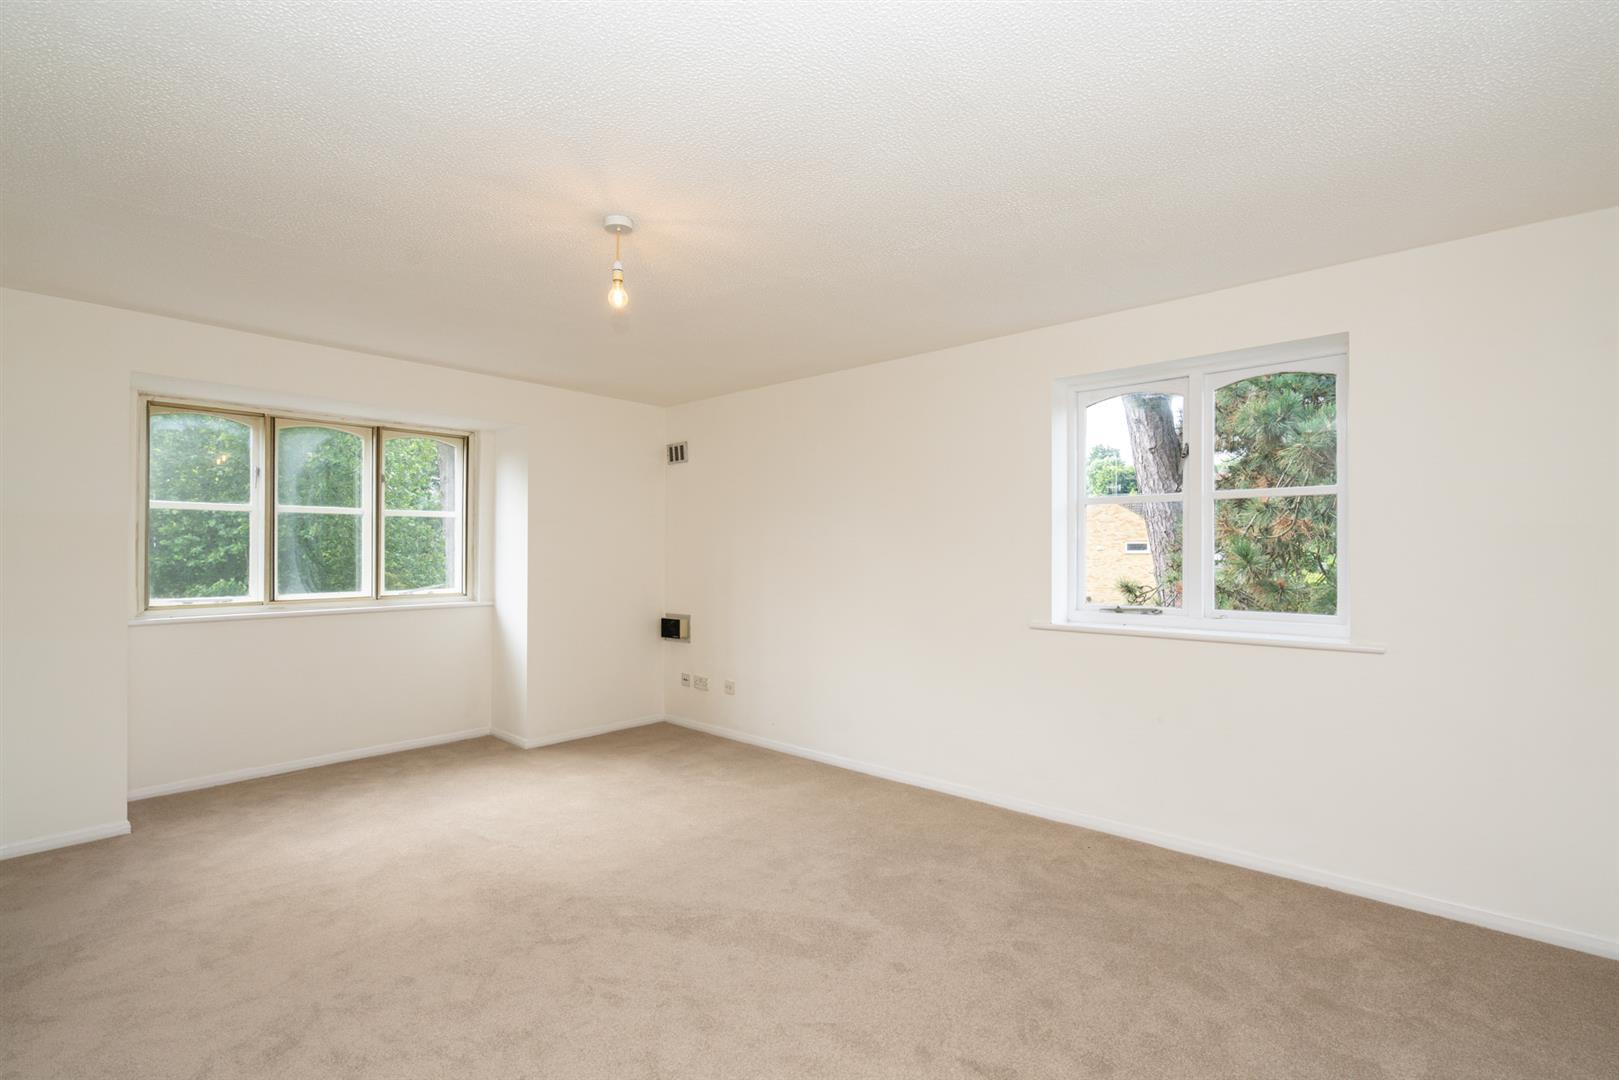 37-Old-Mill-Gardens-2050- living room.jpg